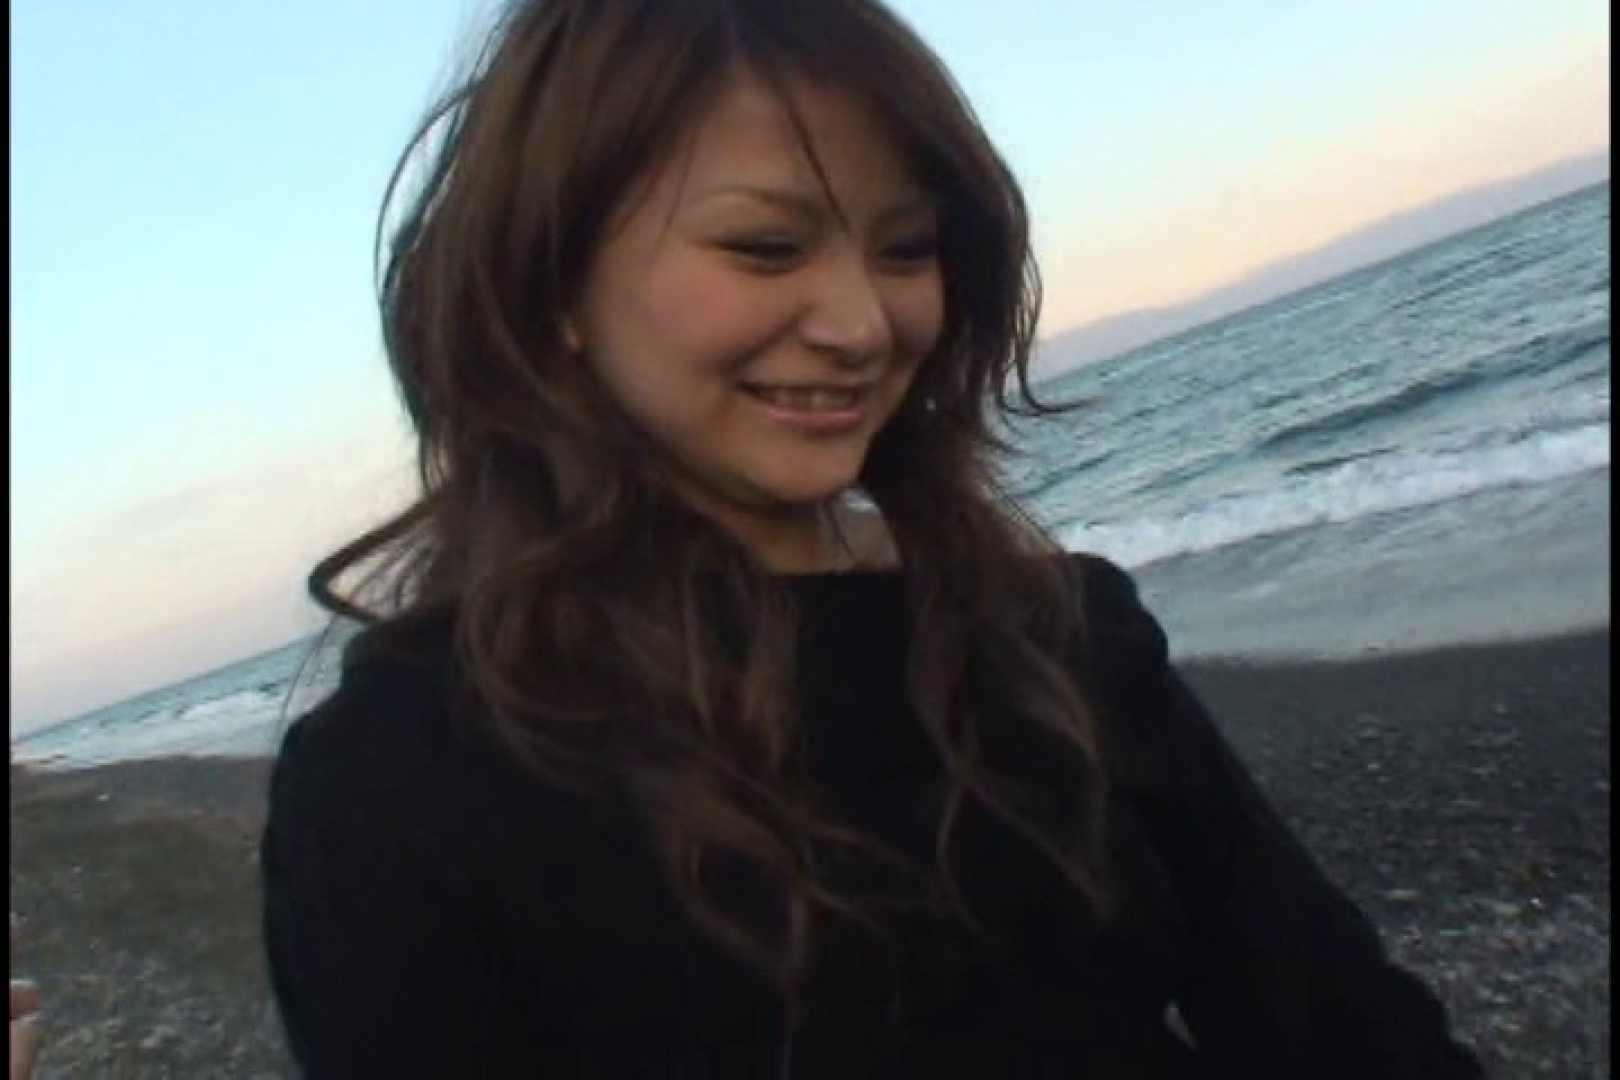 JDハンター全国ツアー vol.009 後編 女子大生のエロ動画 | 0  112PIX 47